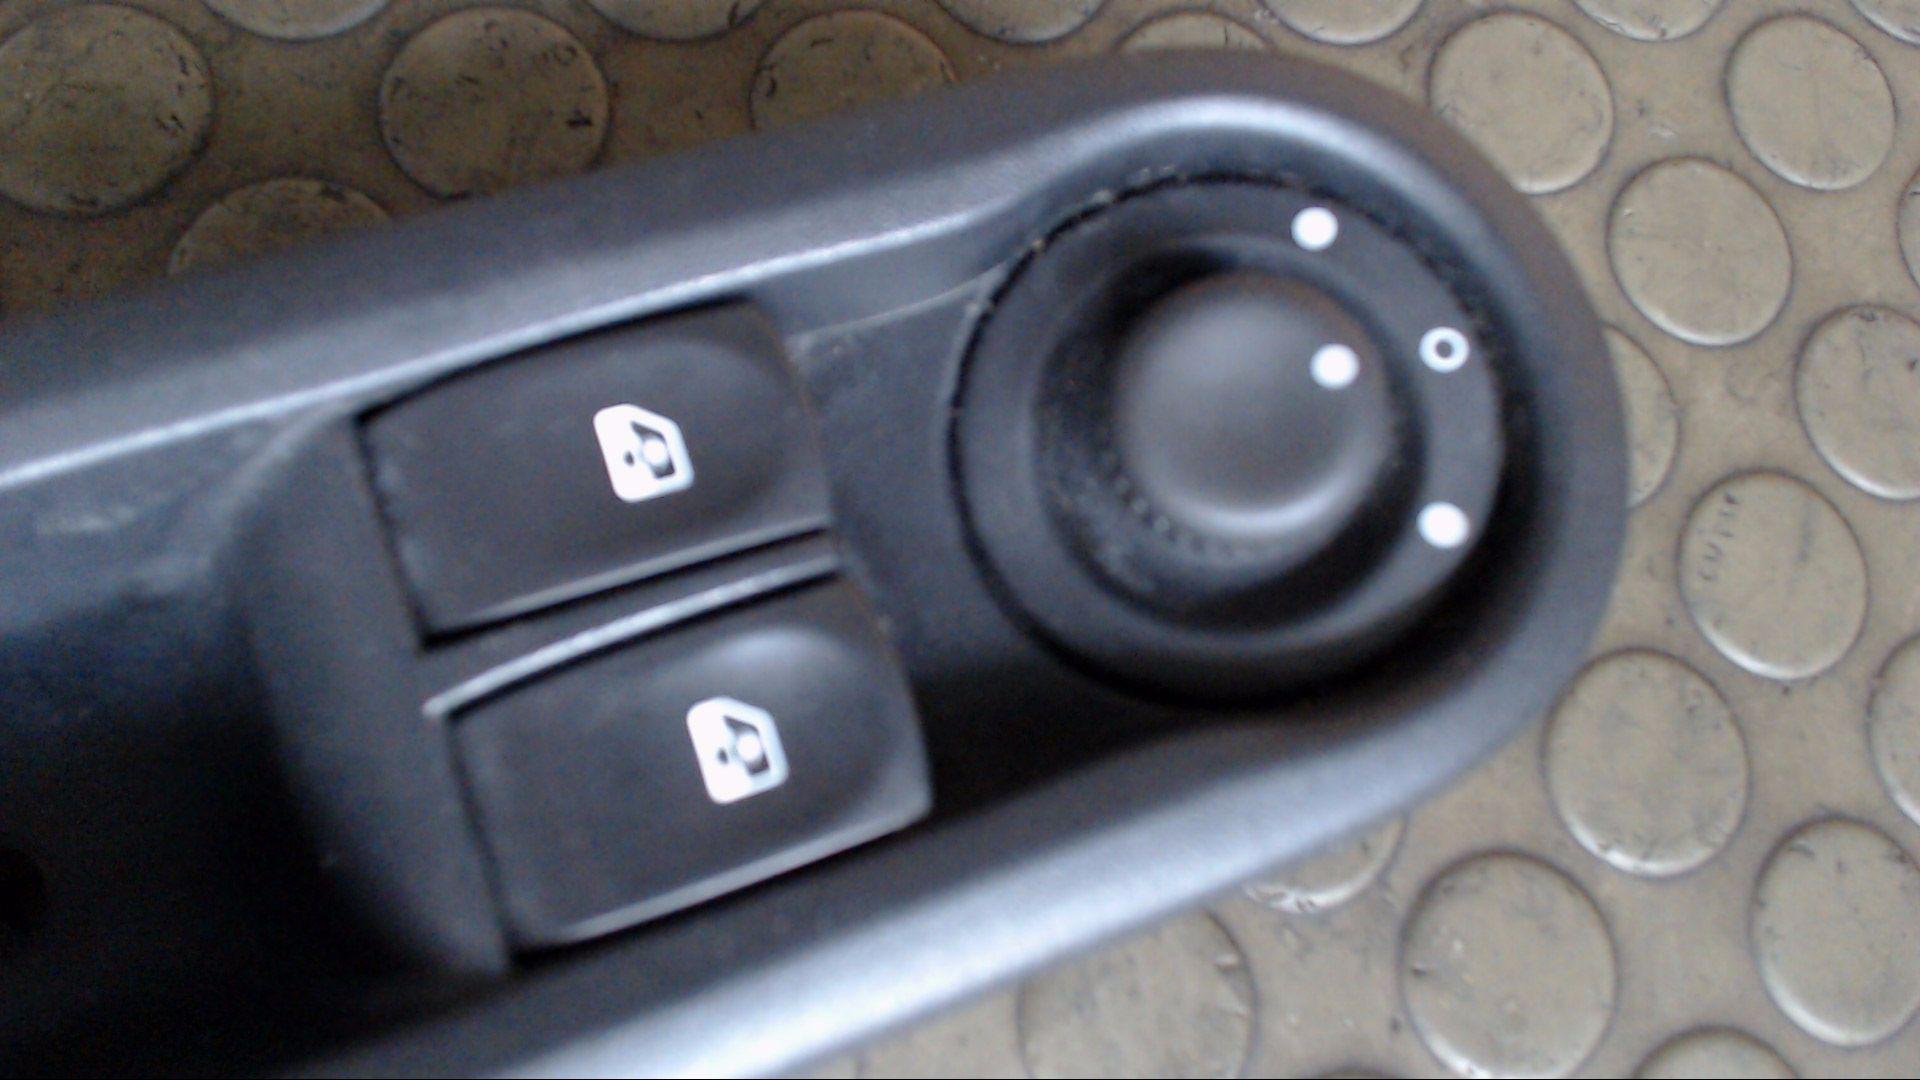 Fensterheberschalter-214939A-Renault-Twingo-N-12-Monate-Garantie Indexbild 2